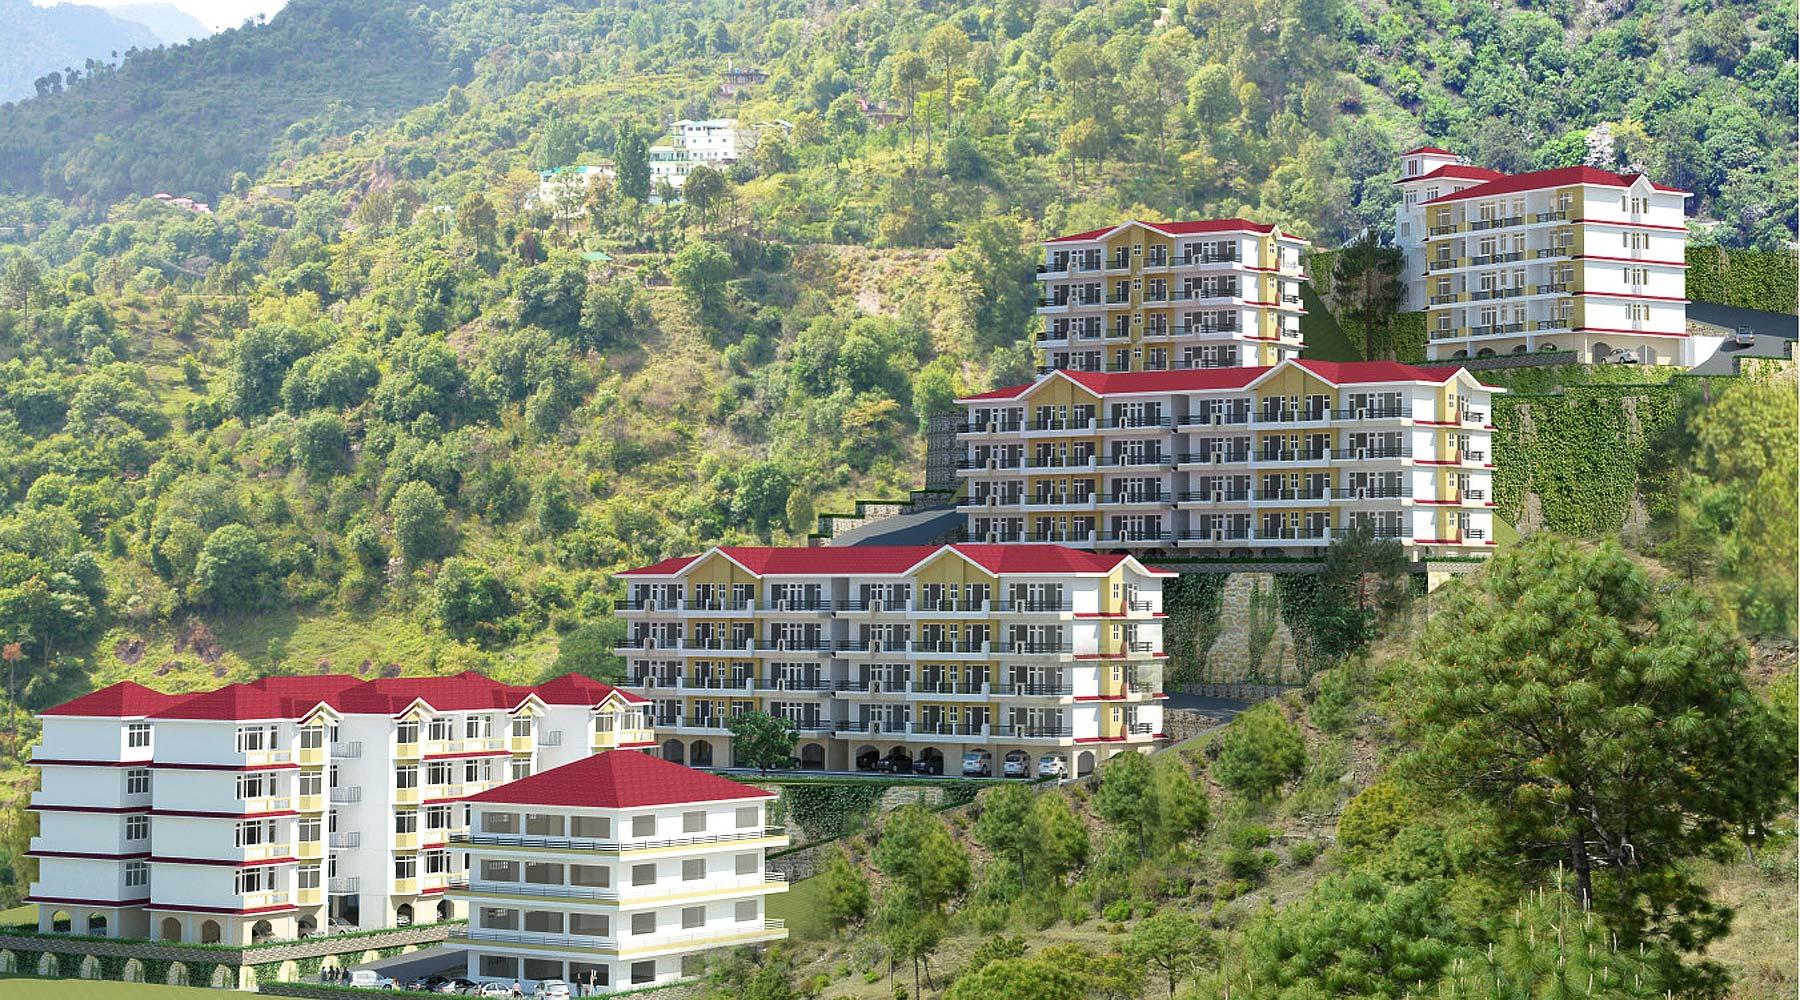 Dev Bhoomi ApartmentsSolan